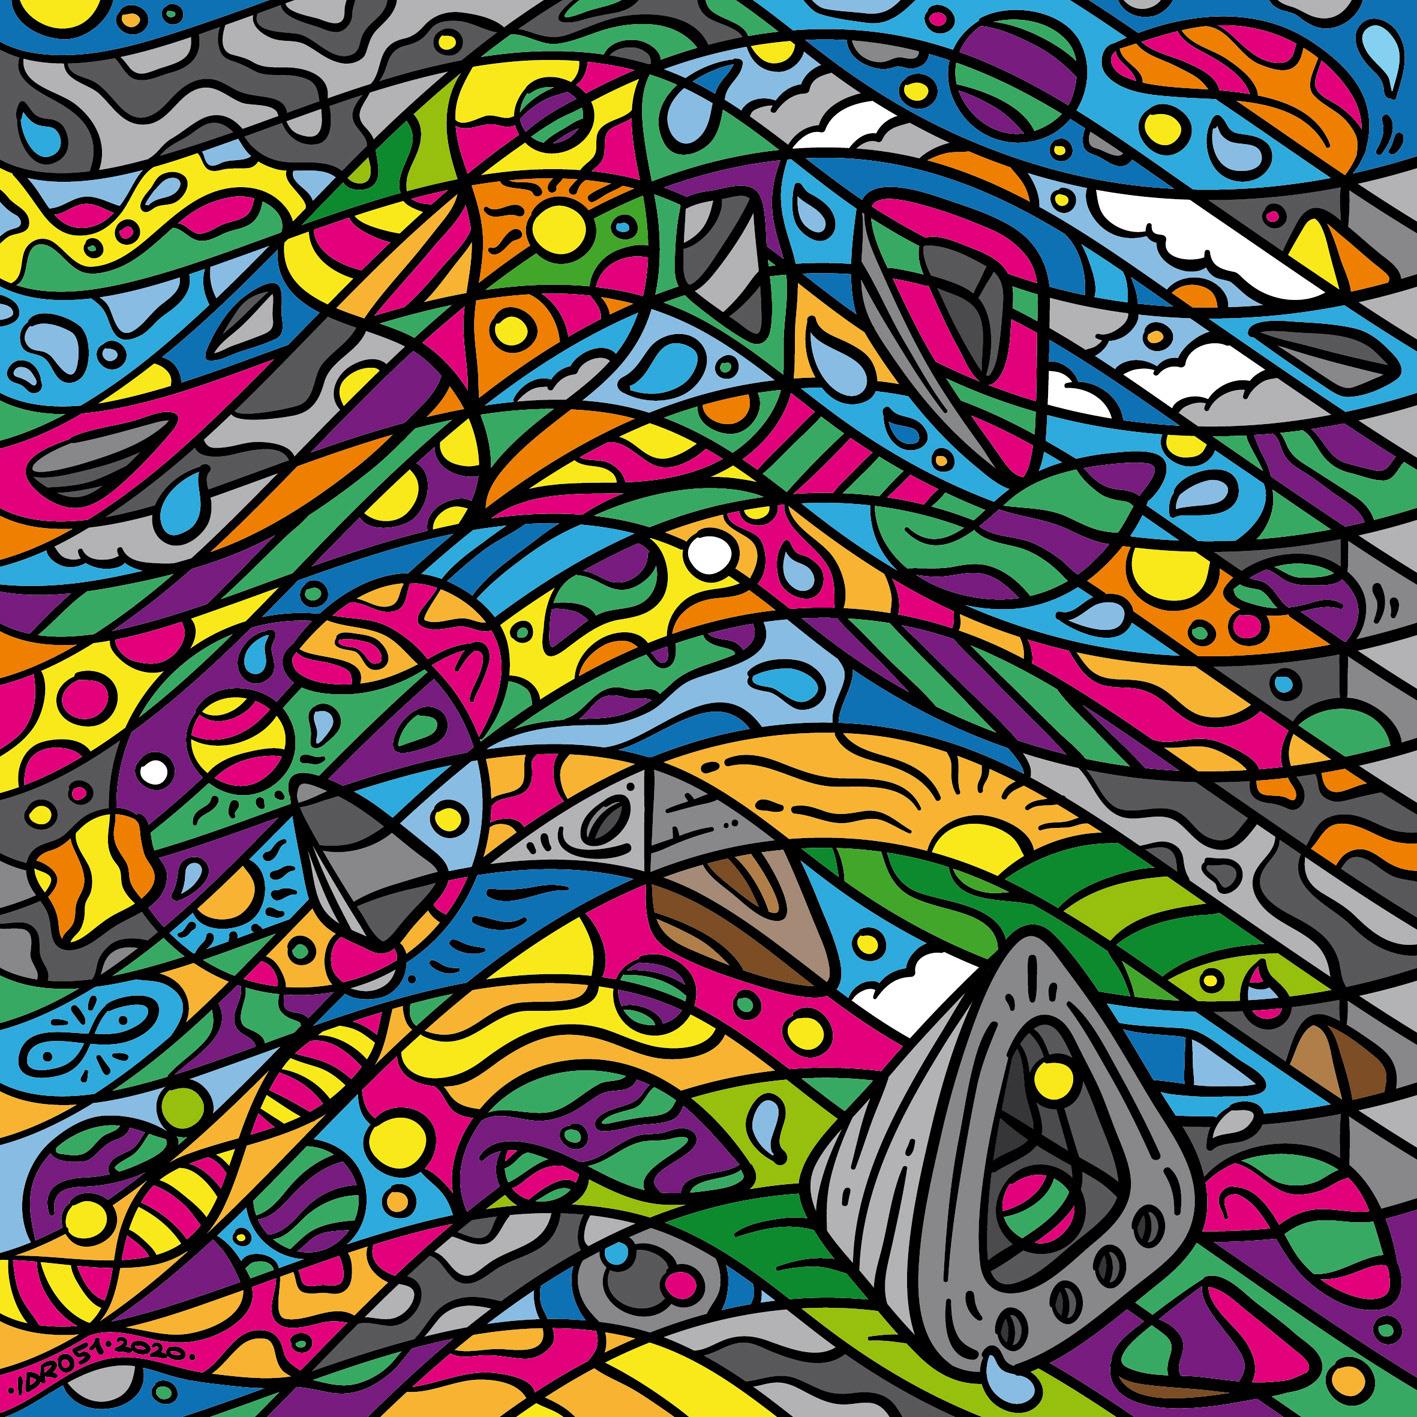 Modular Kaleidoscopic Patterns and Illustration